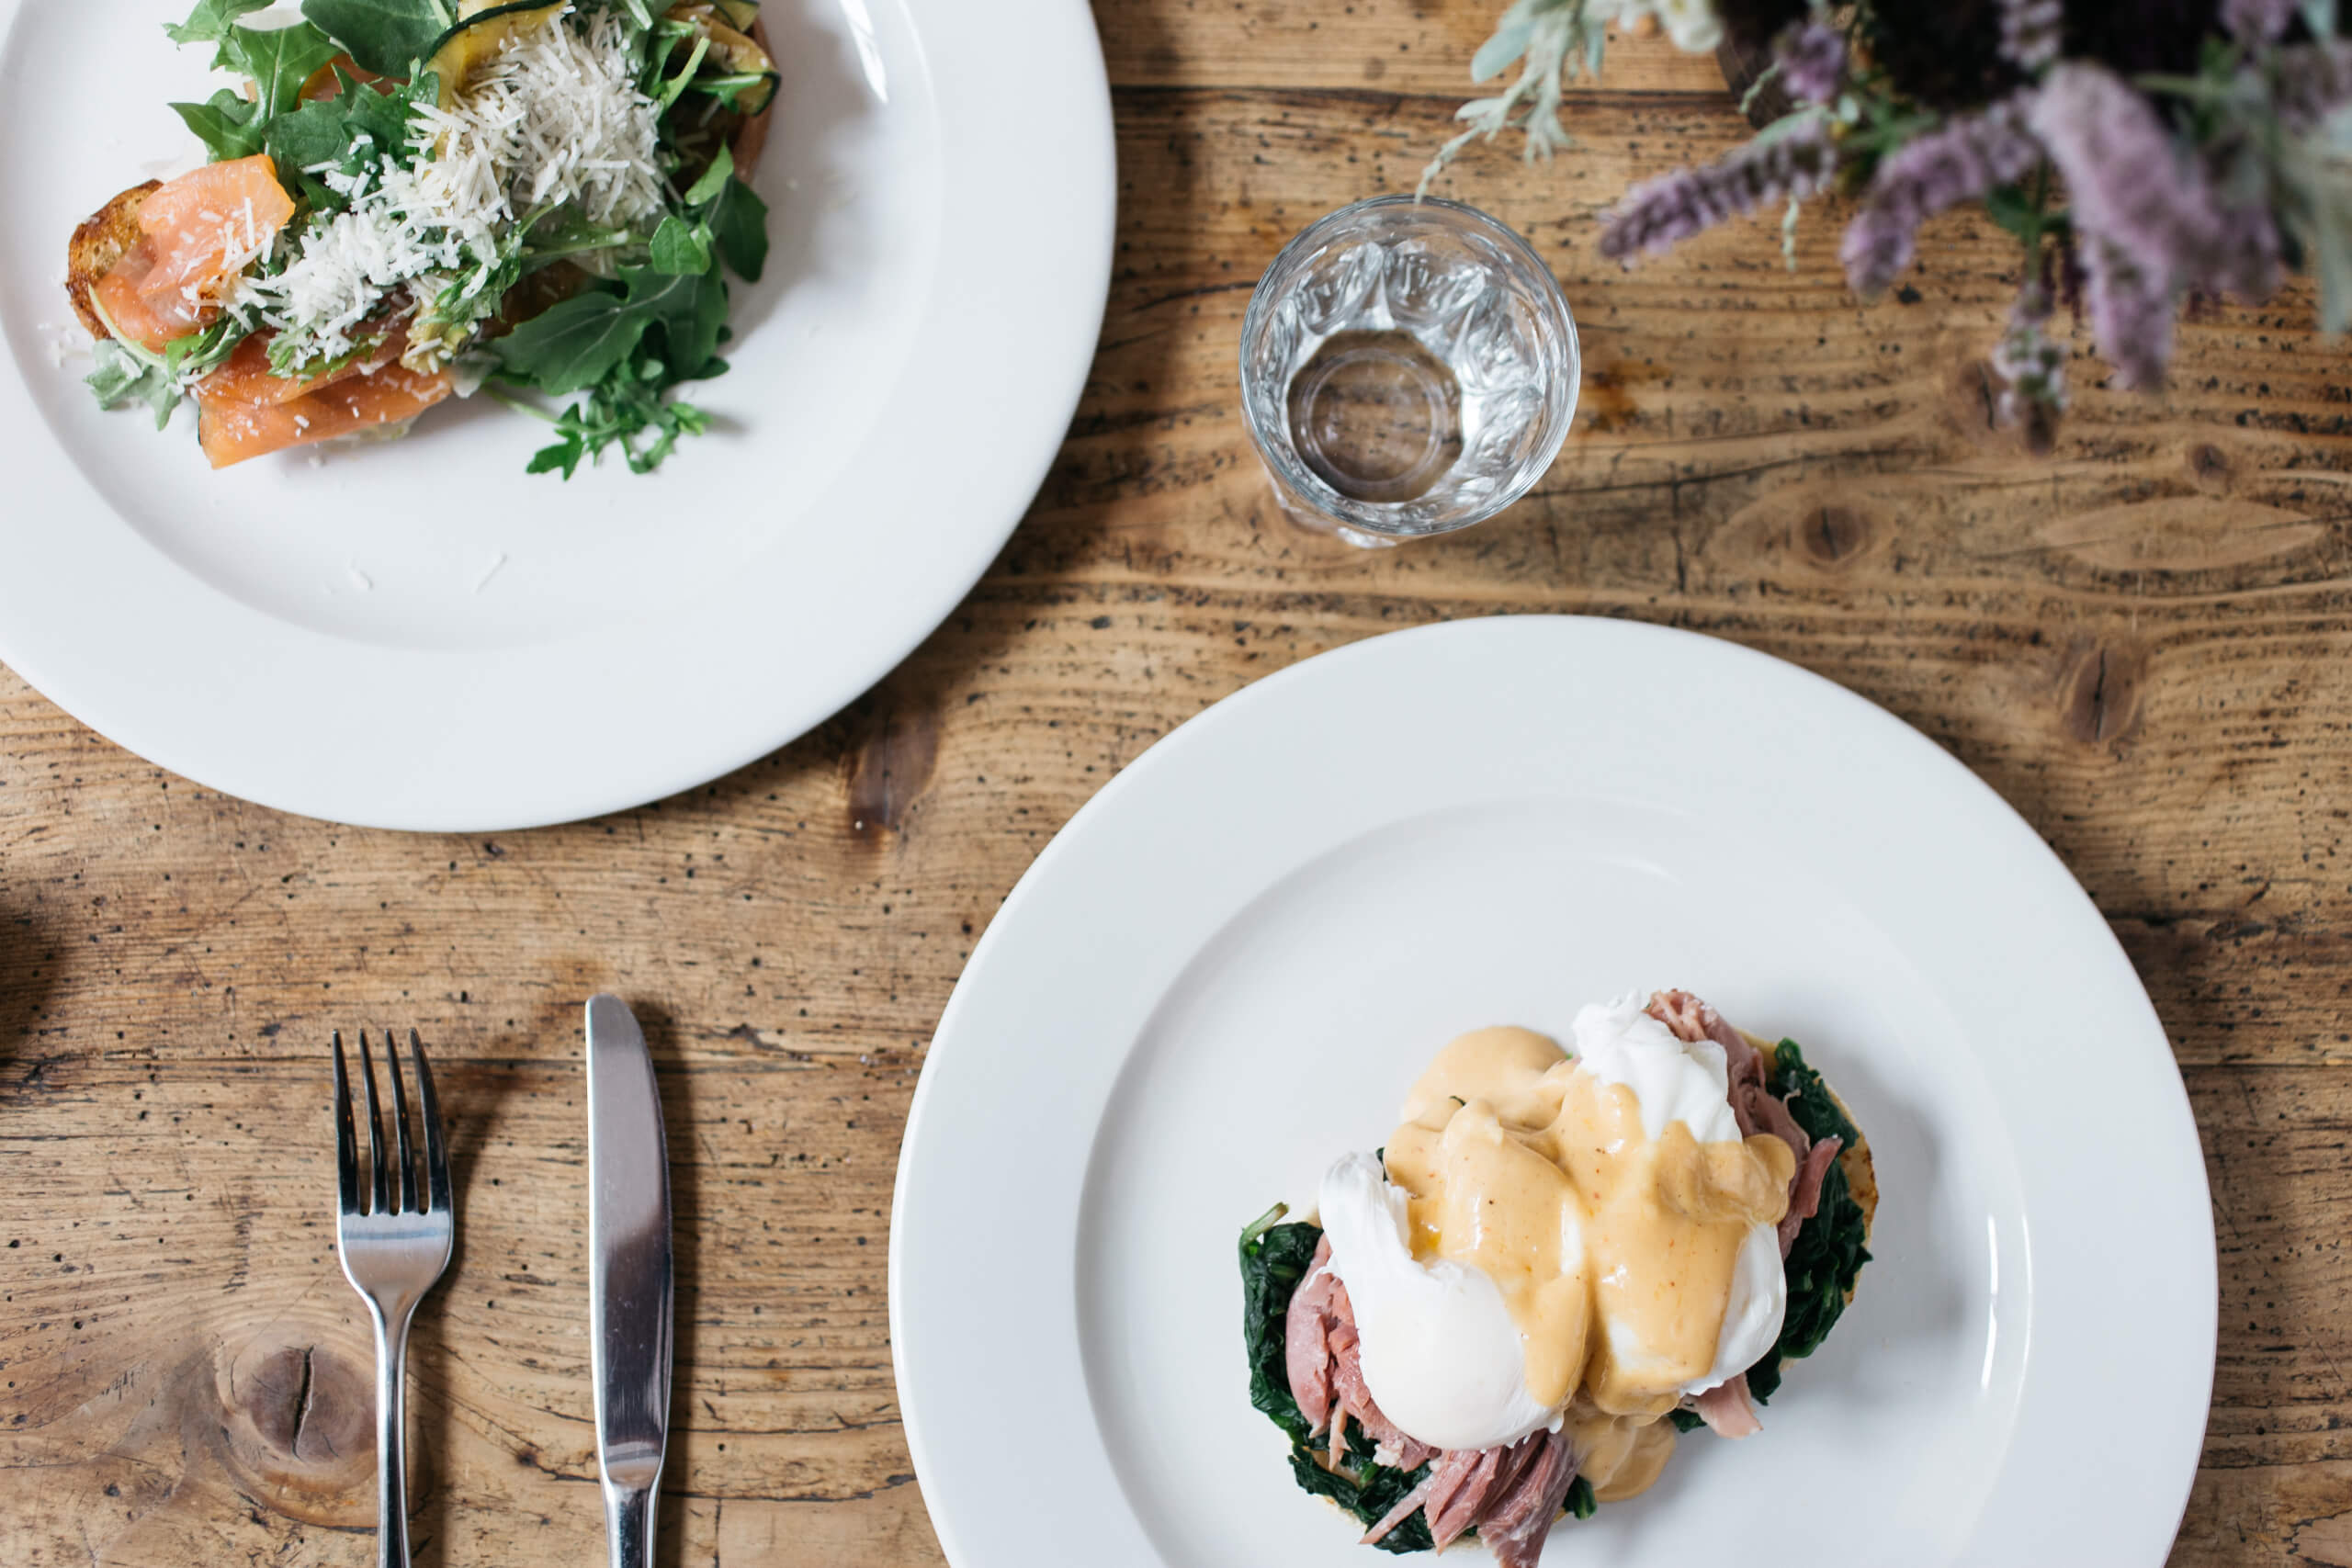 best new restaurants london, best new restaurants in london, best new restaurant london, best new restaurant in london, new best restaurants london